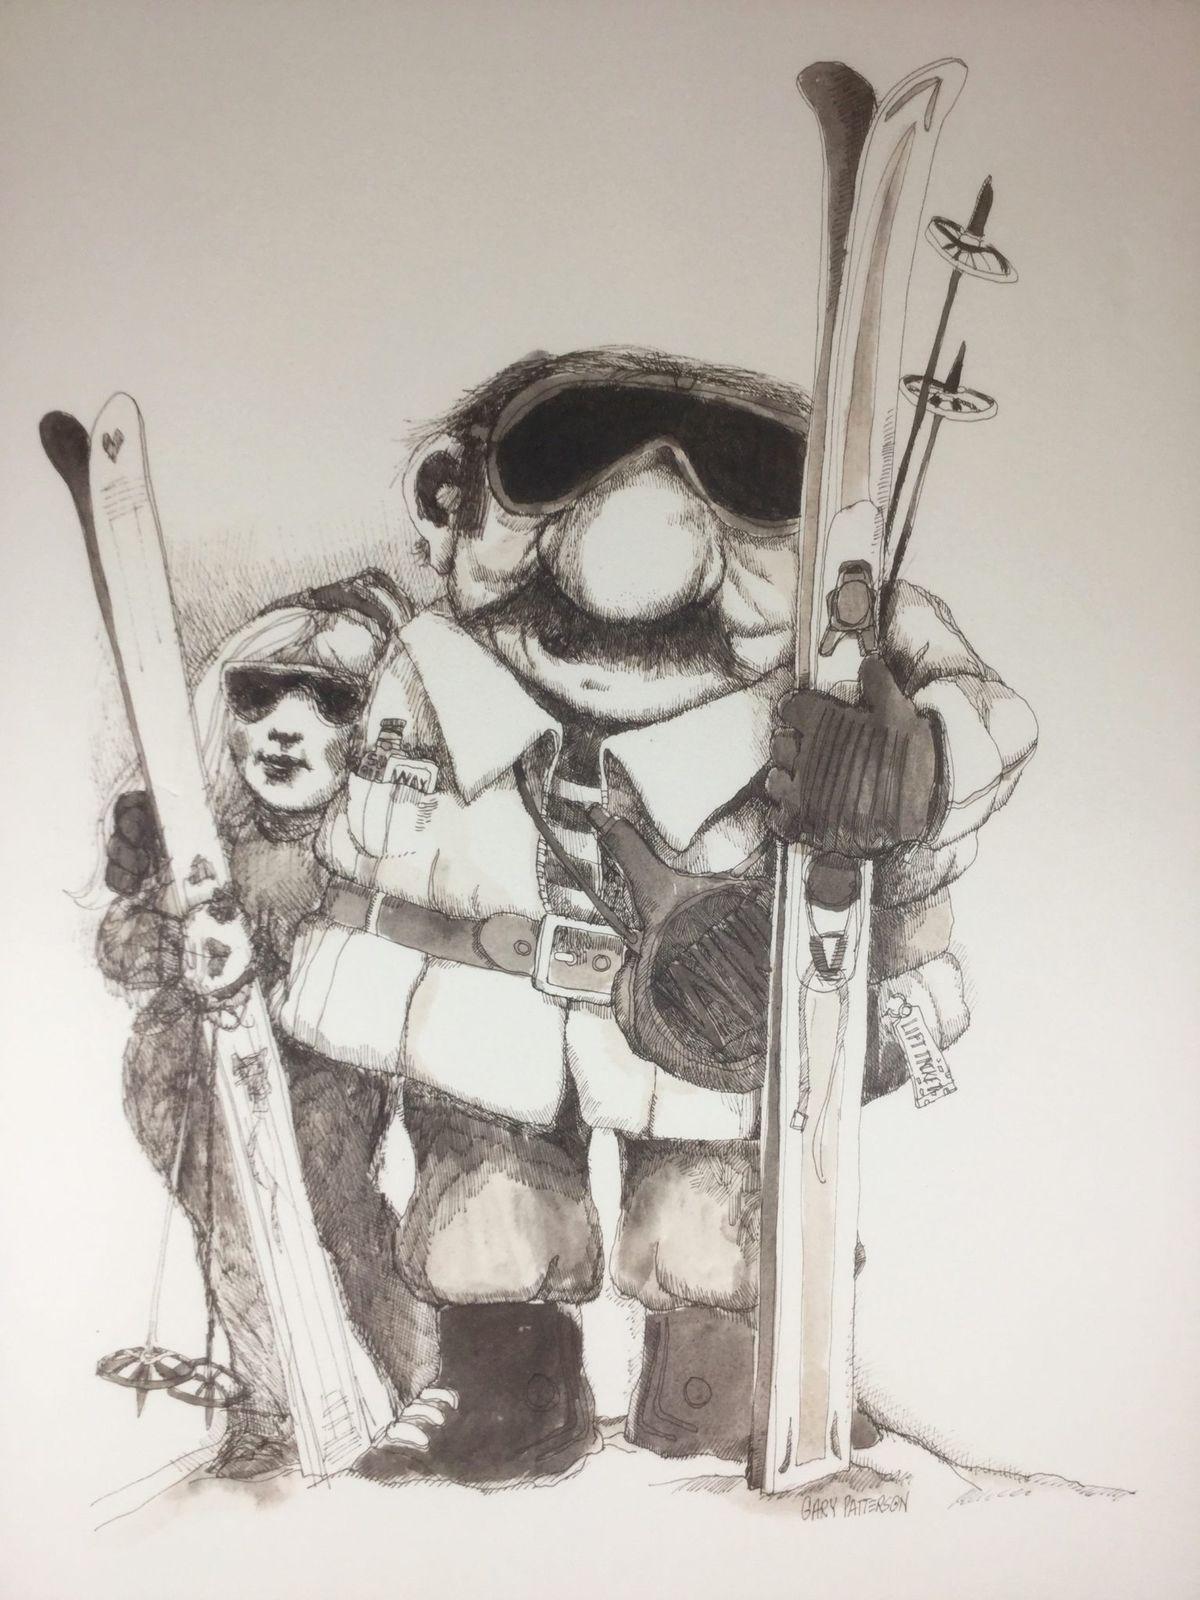 Vtg 1970s Ski Art Poster Snow People Gary Patterson Retro